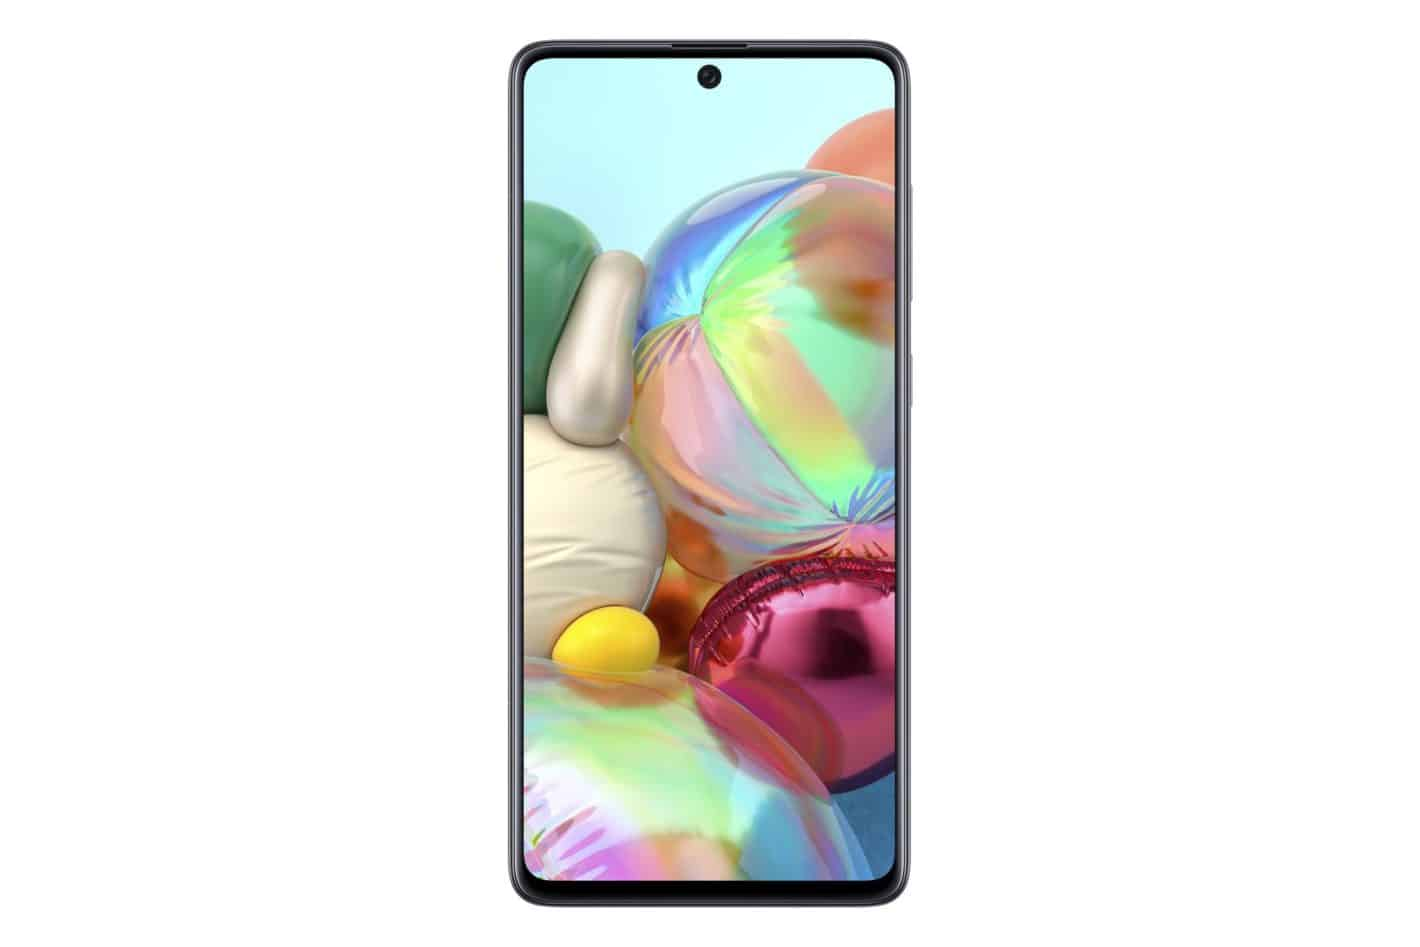 Galaxy A71 image 2